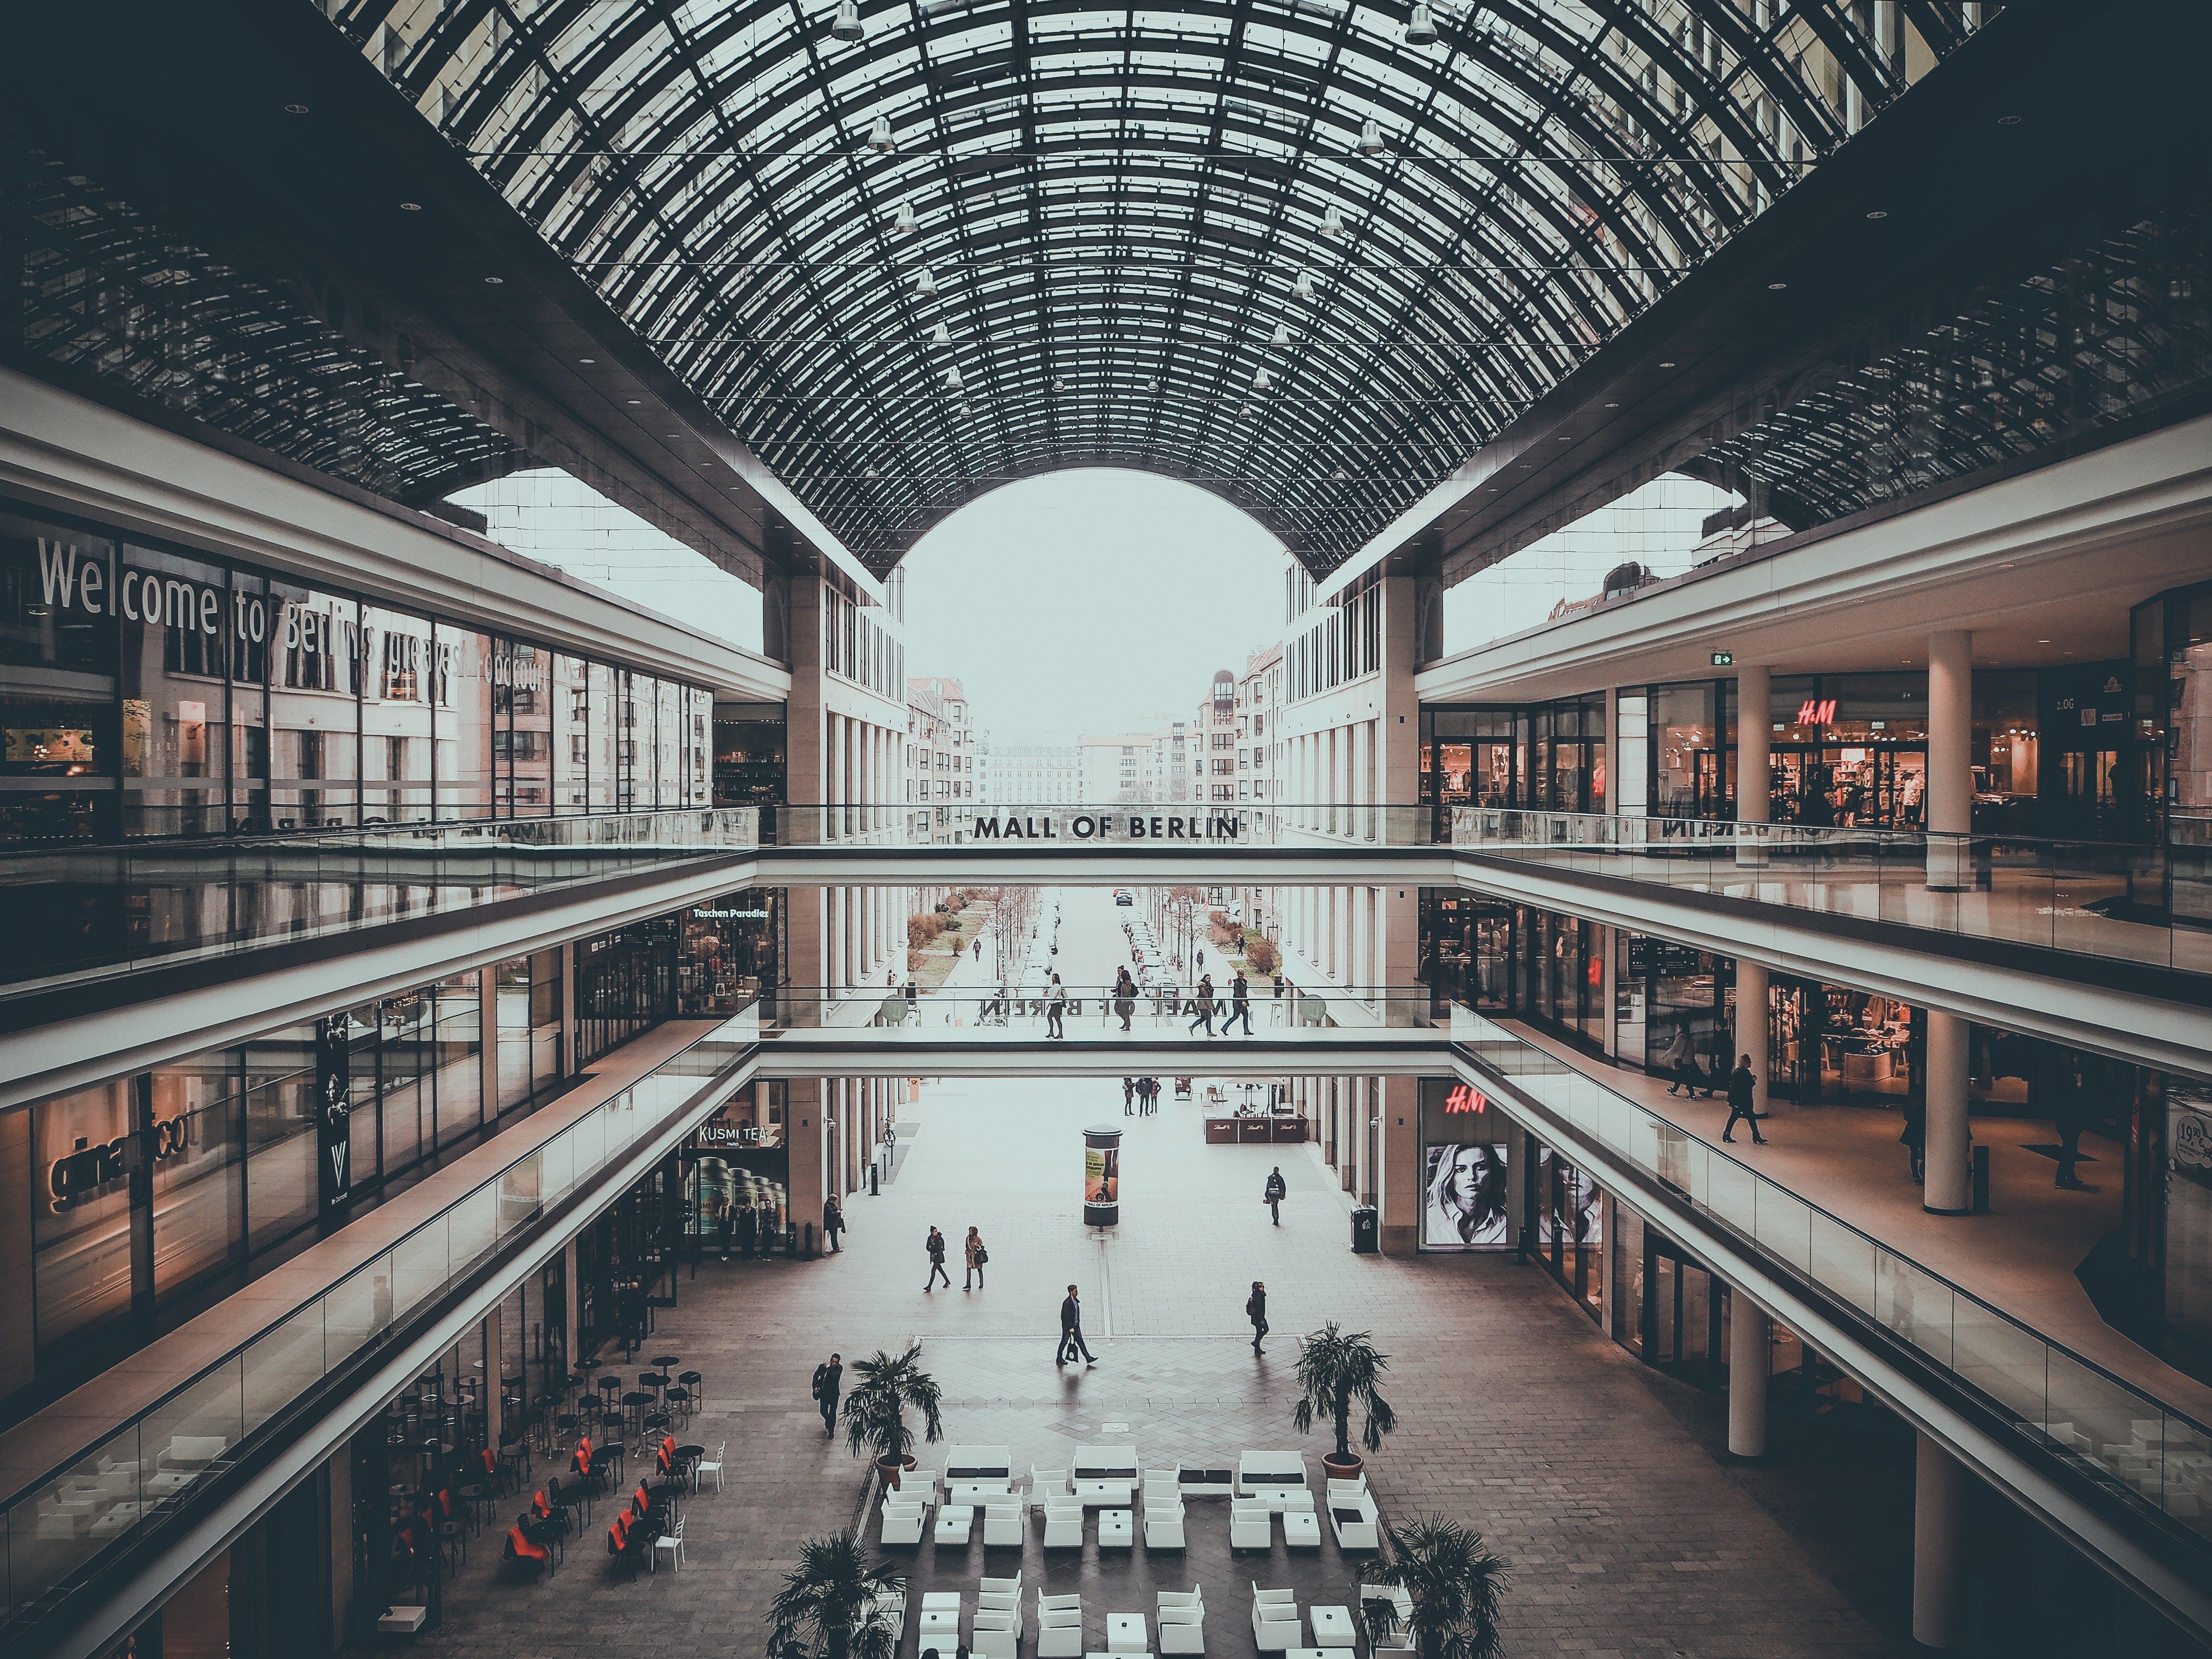 architecture, building, ceiling